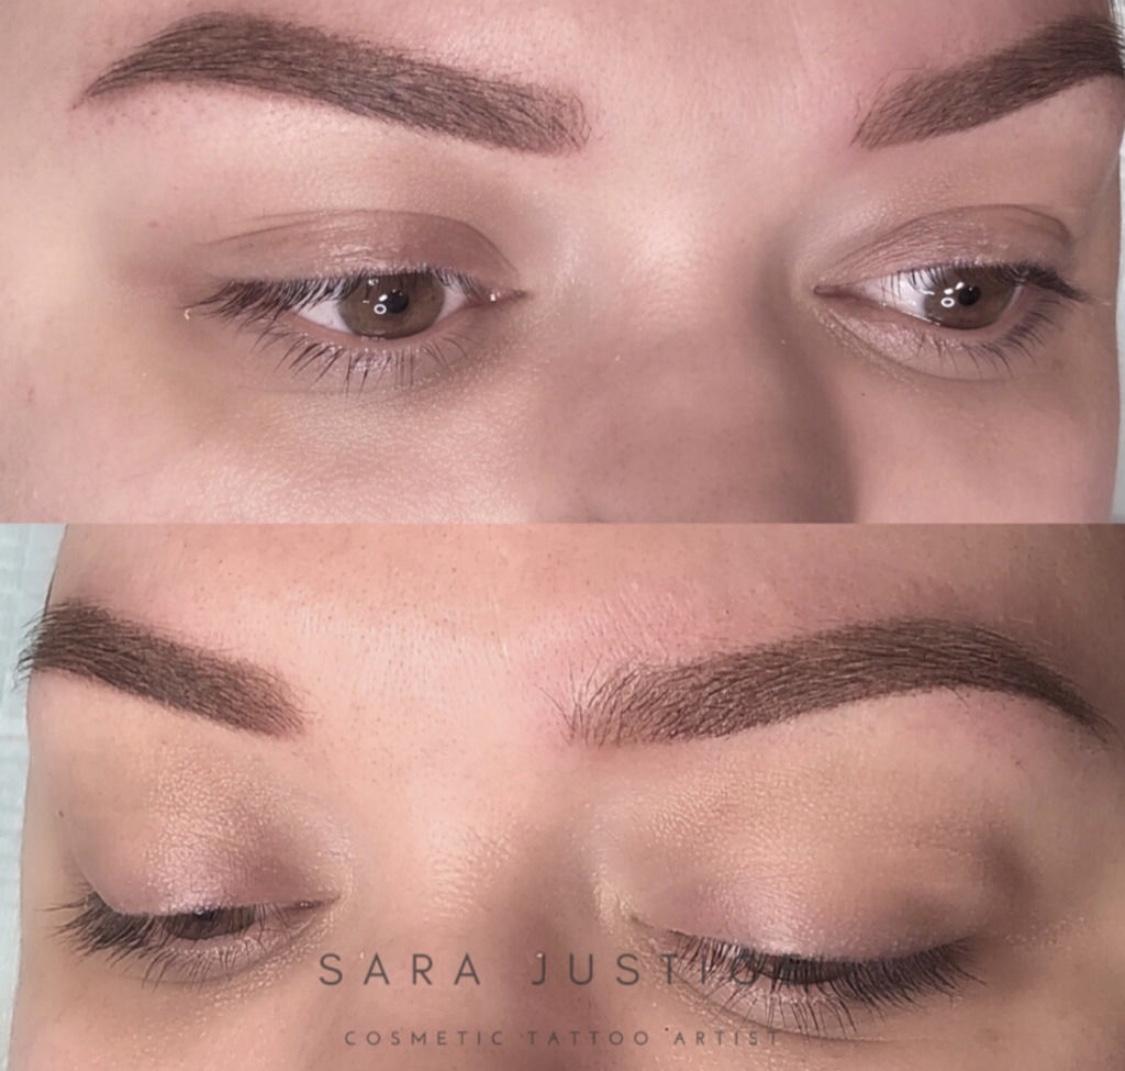 3d Microblading For Eyebrows In Atlanta Ga Sara Justice